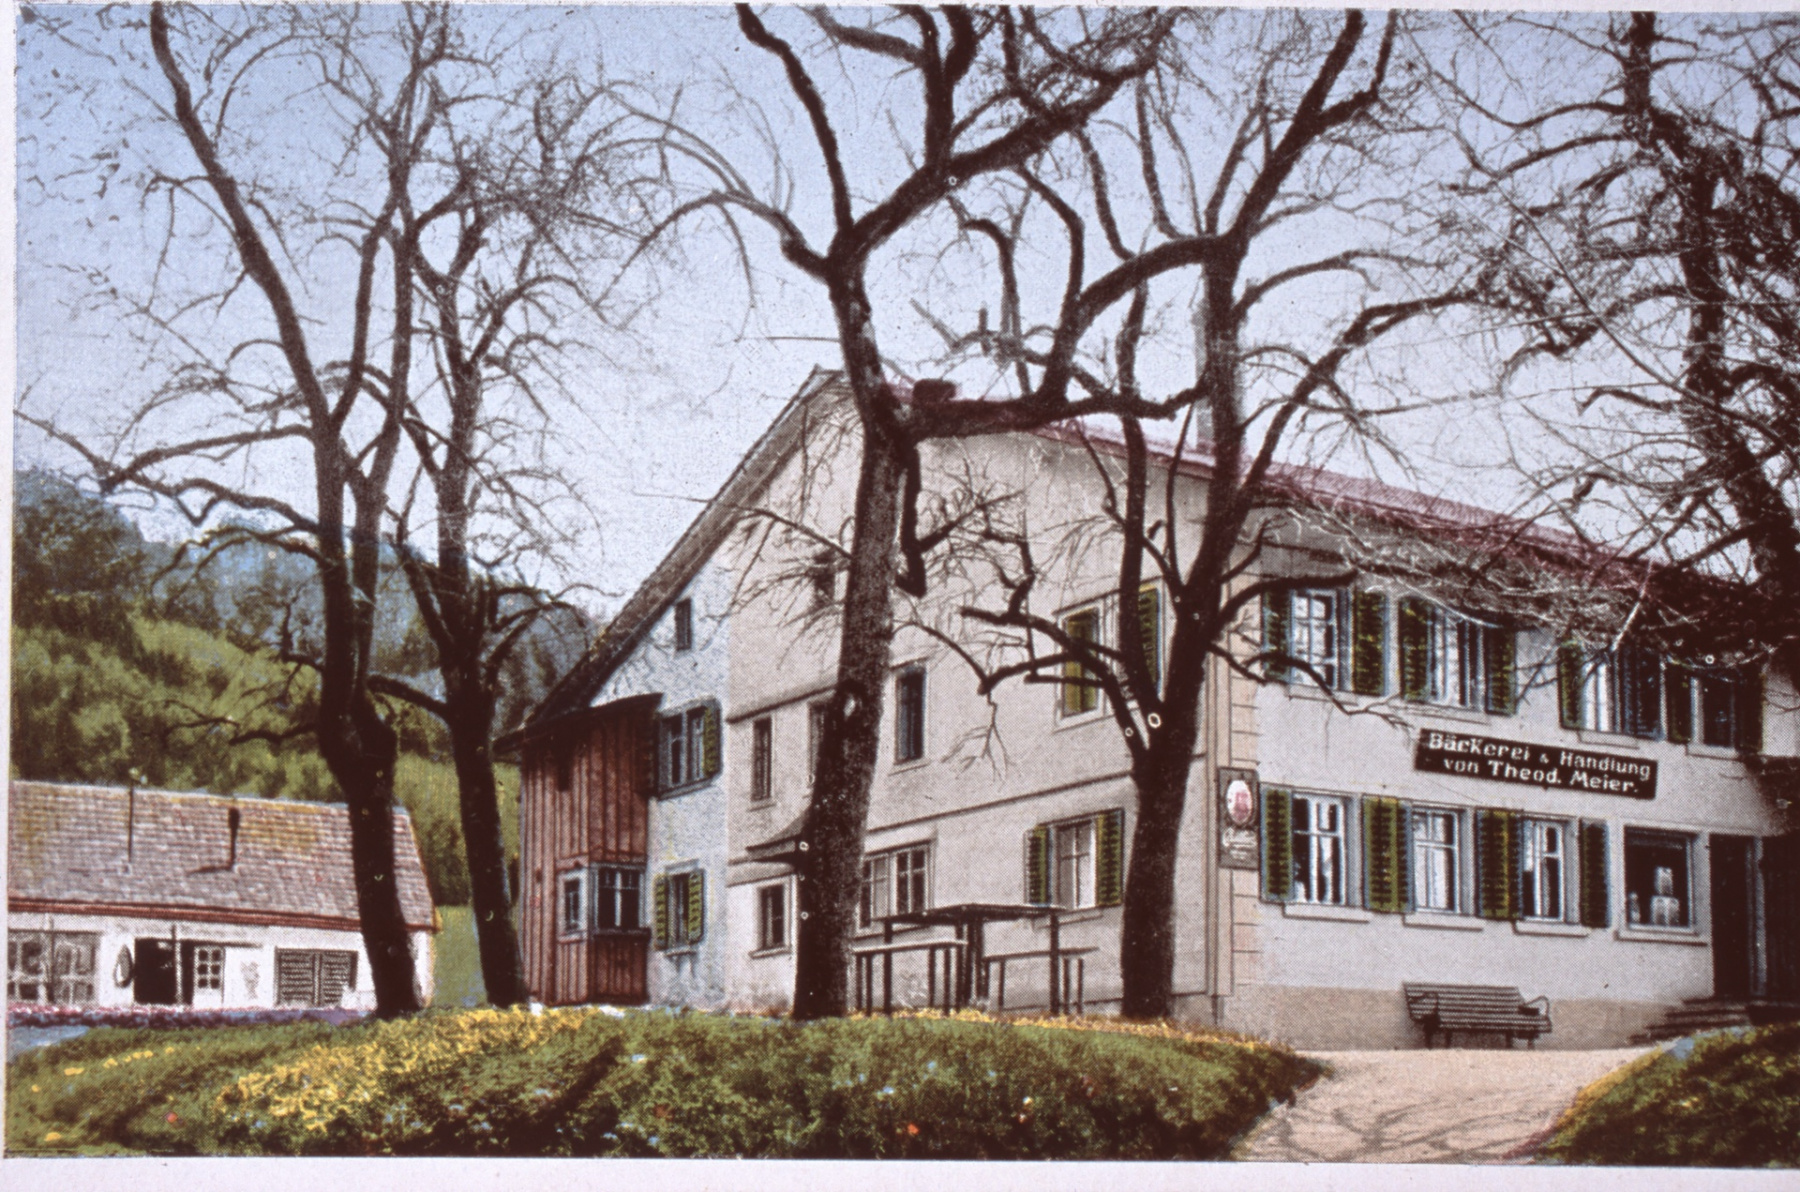 Ansichtskarte Bäckerei Th. Meier